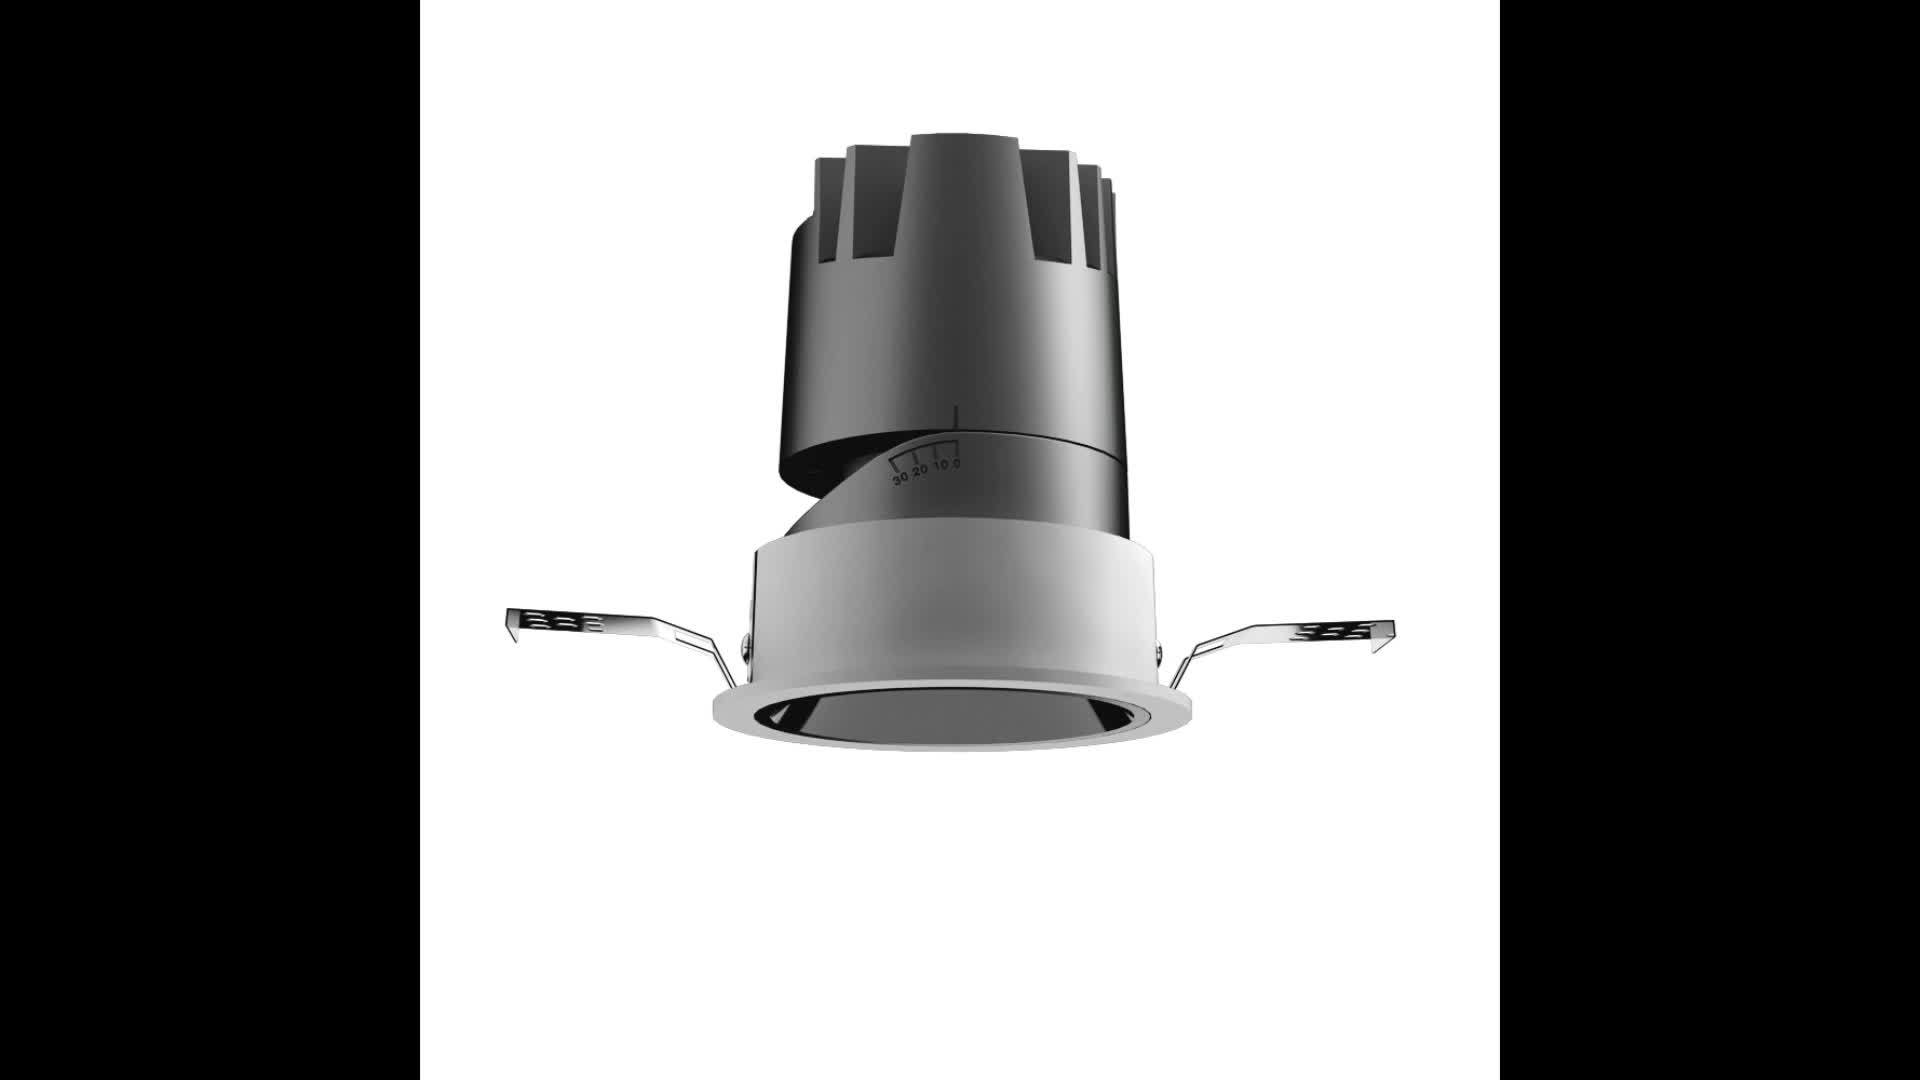 7W/12W/20W Anti Glare Dimmable Wall Washer Commercial Hotel Indoor Spotlight 조명 조절 가능한 천장 LED 다운 스팟 조명